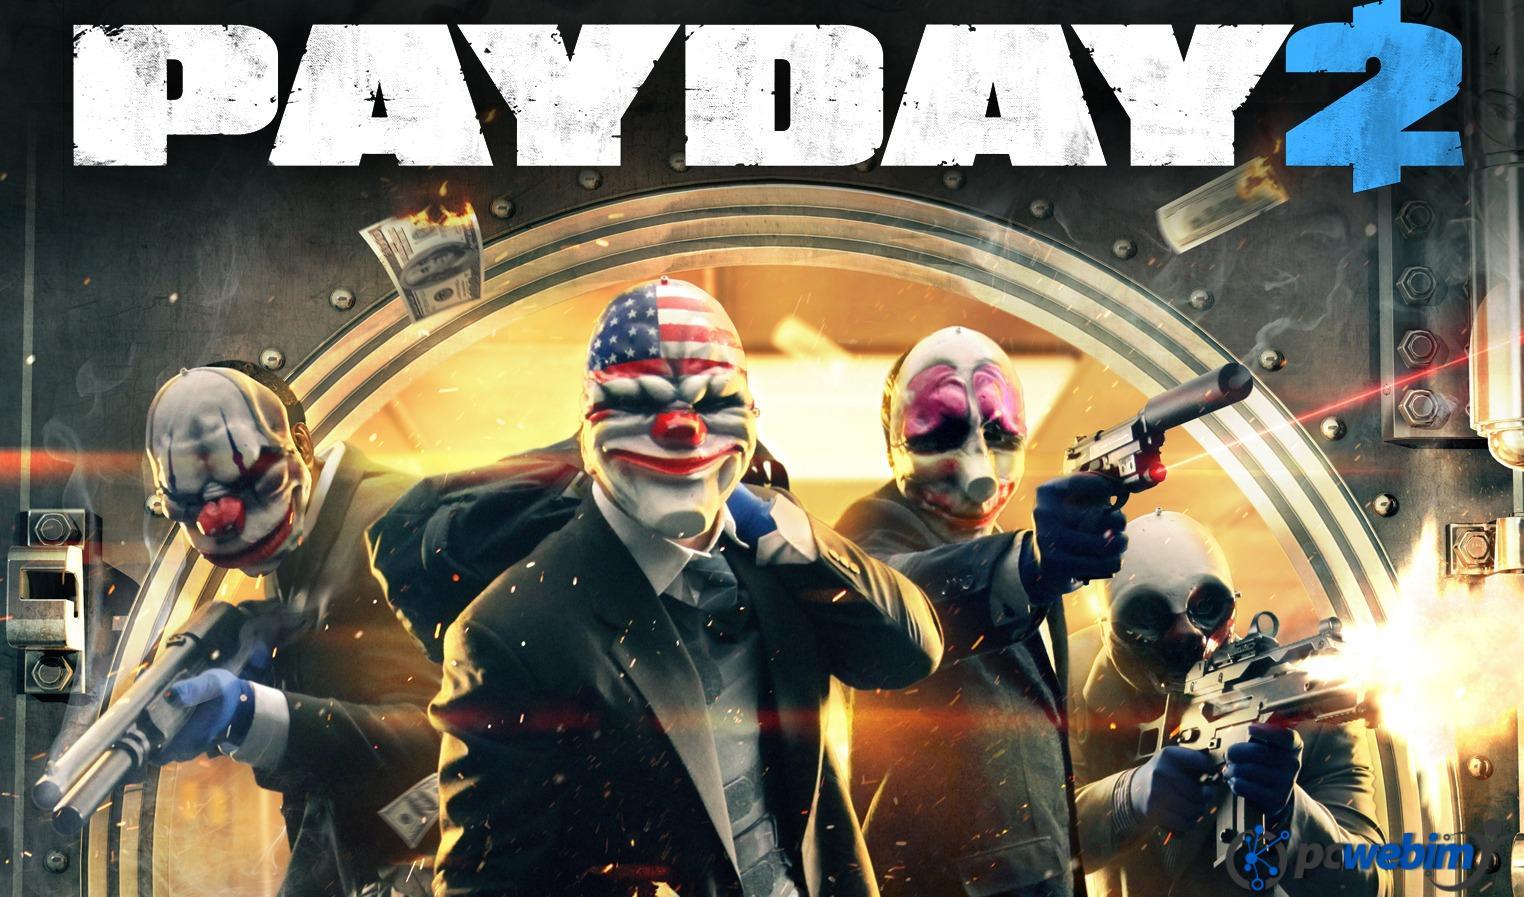 Payday-2-Career-Criminal-Edition-logo